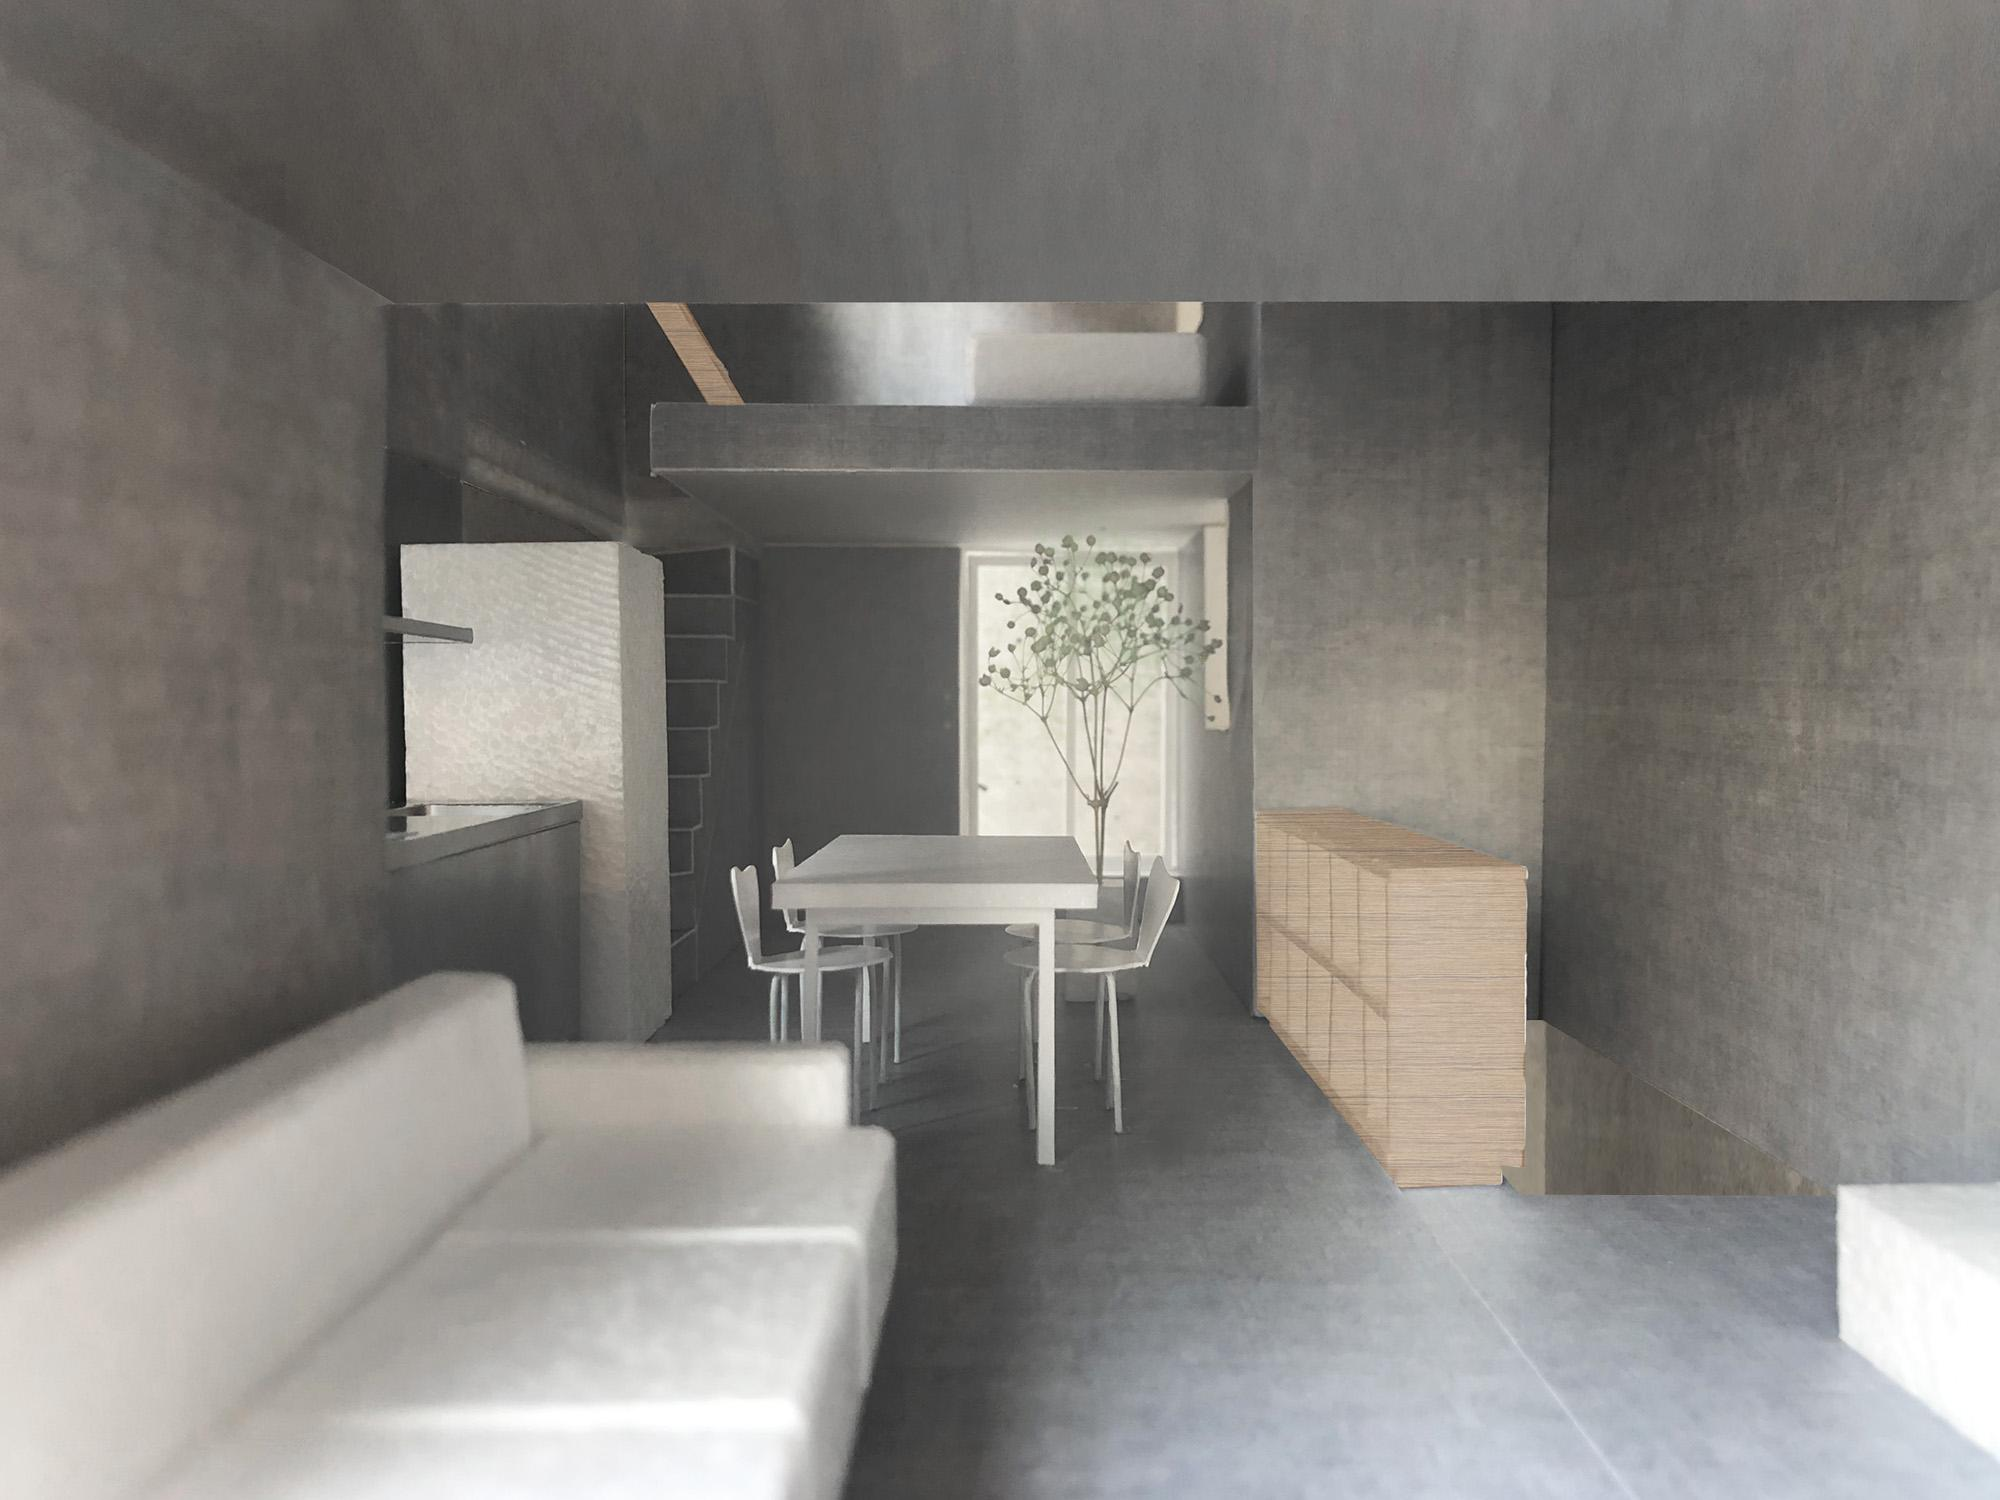 F号室はグレーを基調とした無機質な空間を予定